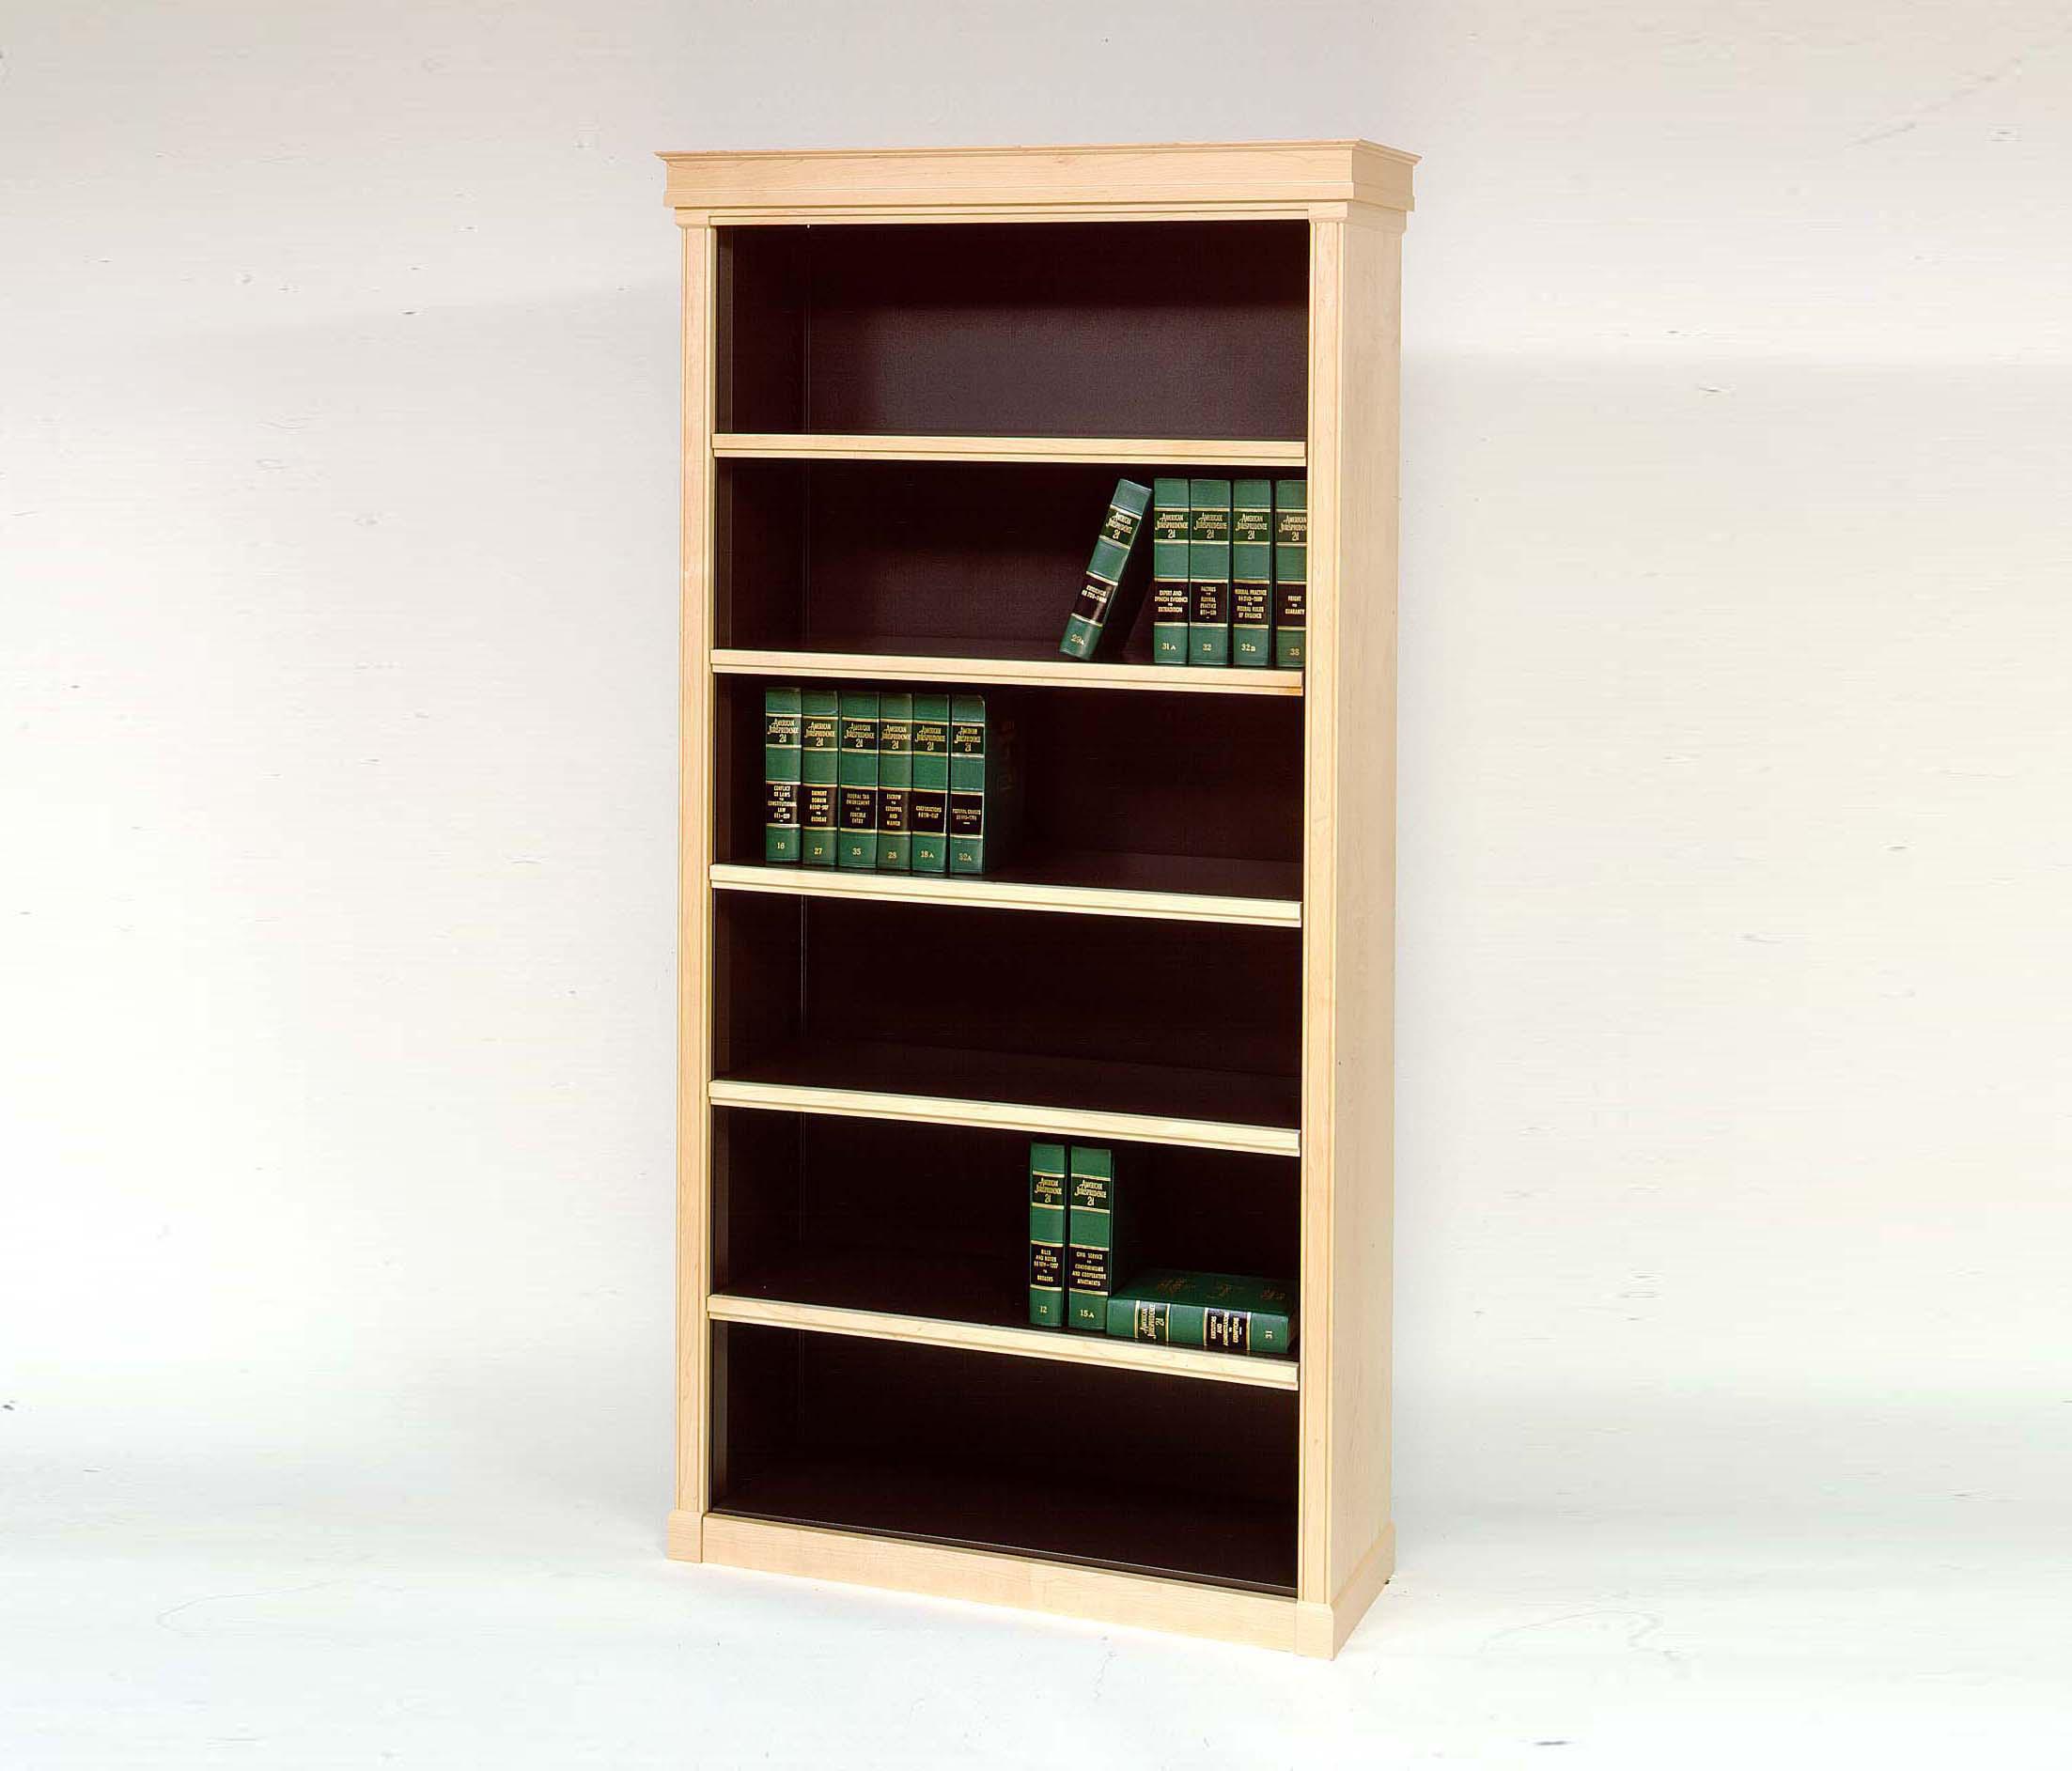 Wood Tek Diplomat Shelving By Aurora Storage | Shelving